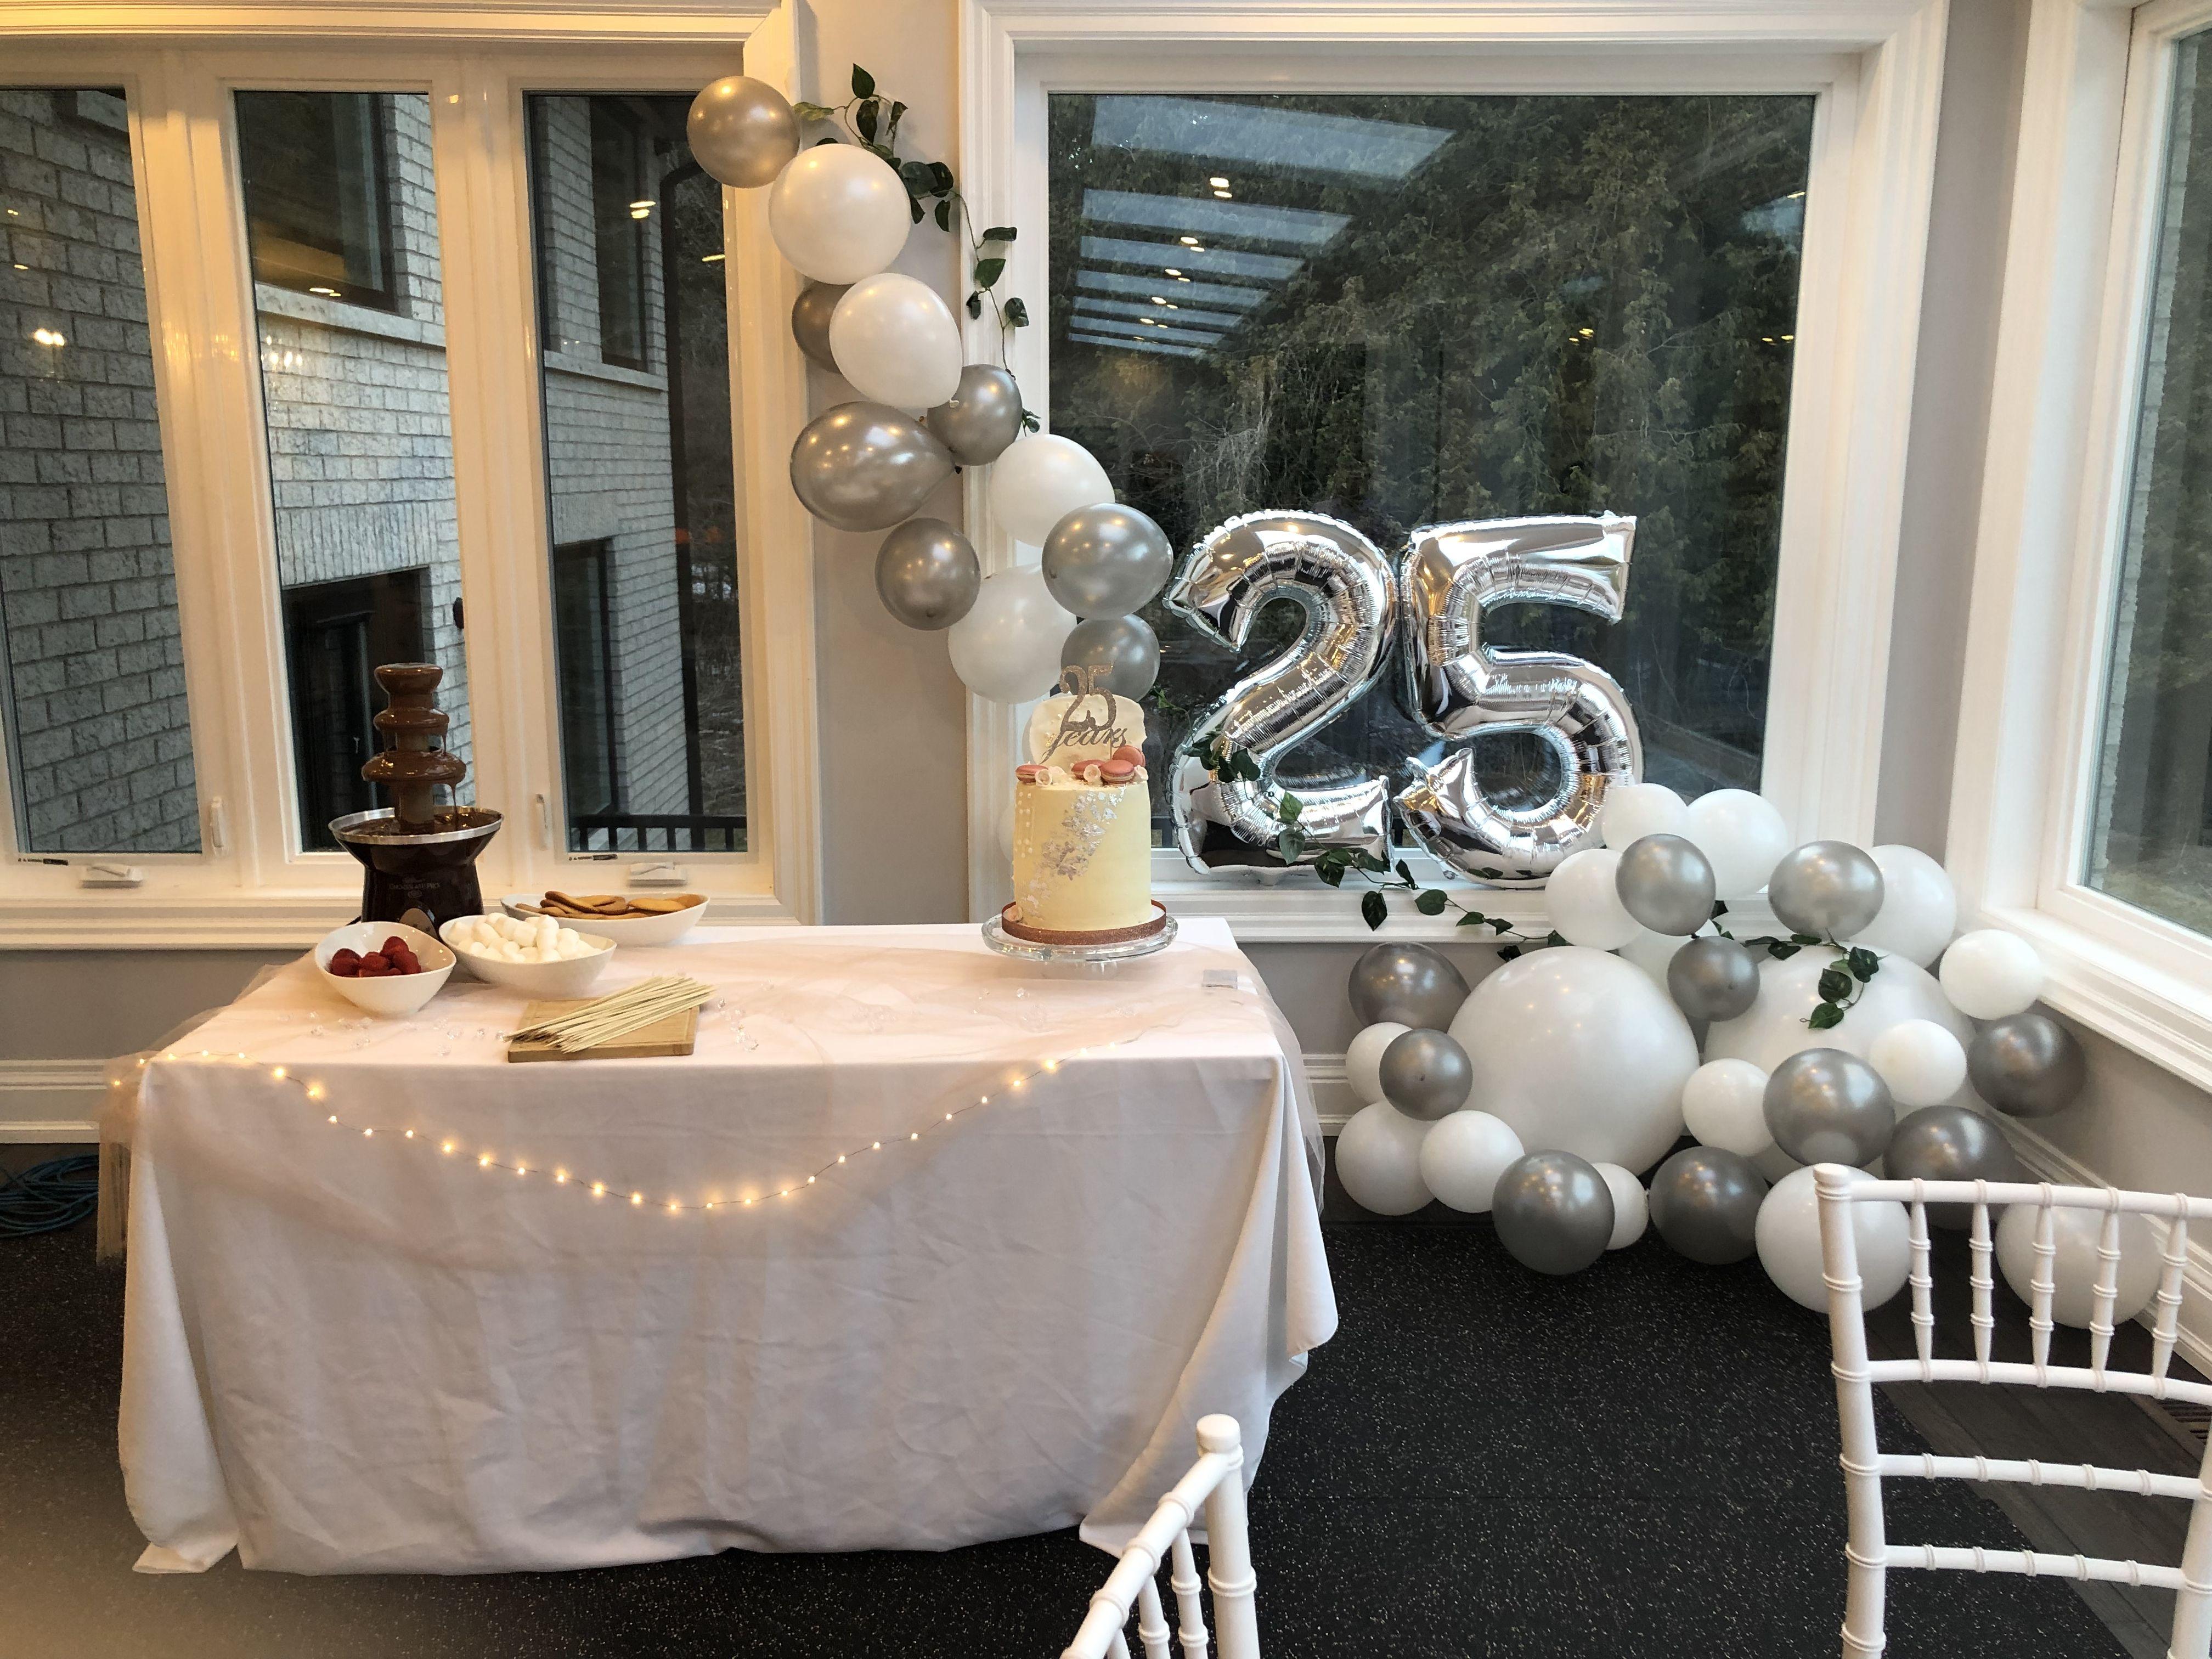 25th anniversary cake & decor | 25th anniversary party, 25 ...